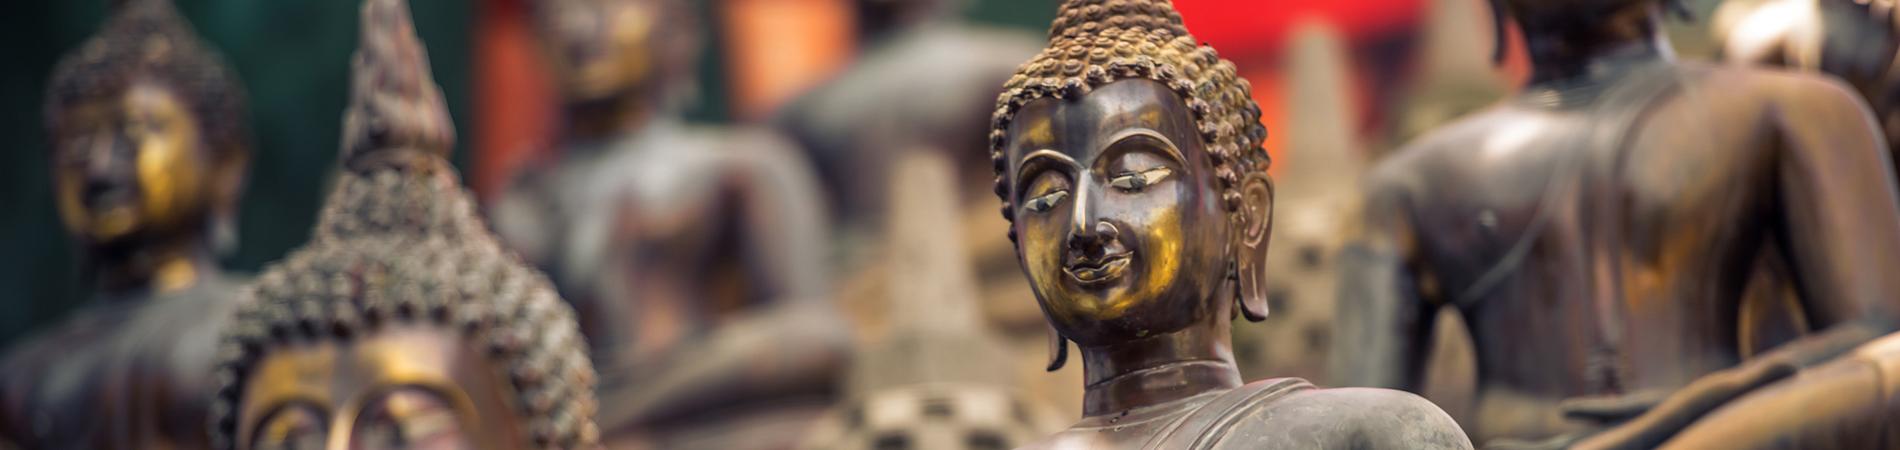 shutterstock – SRI – buddhas header